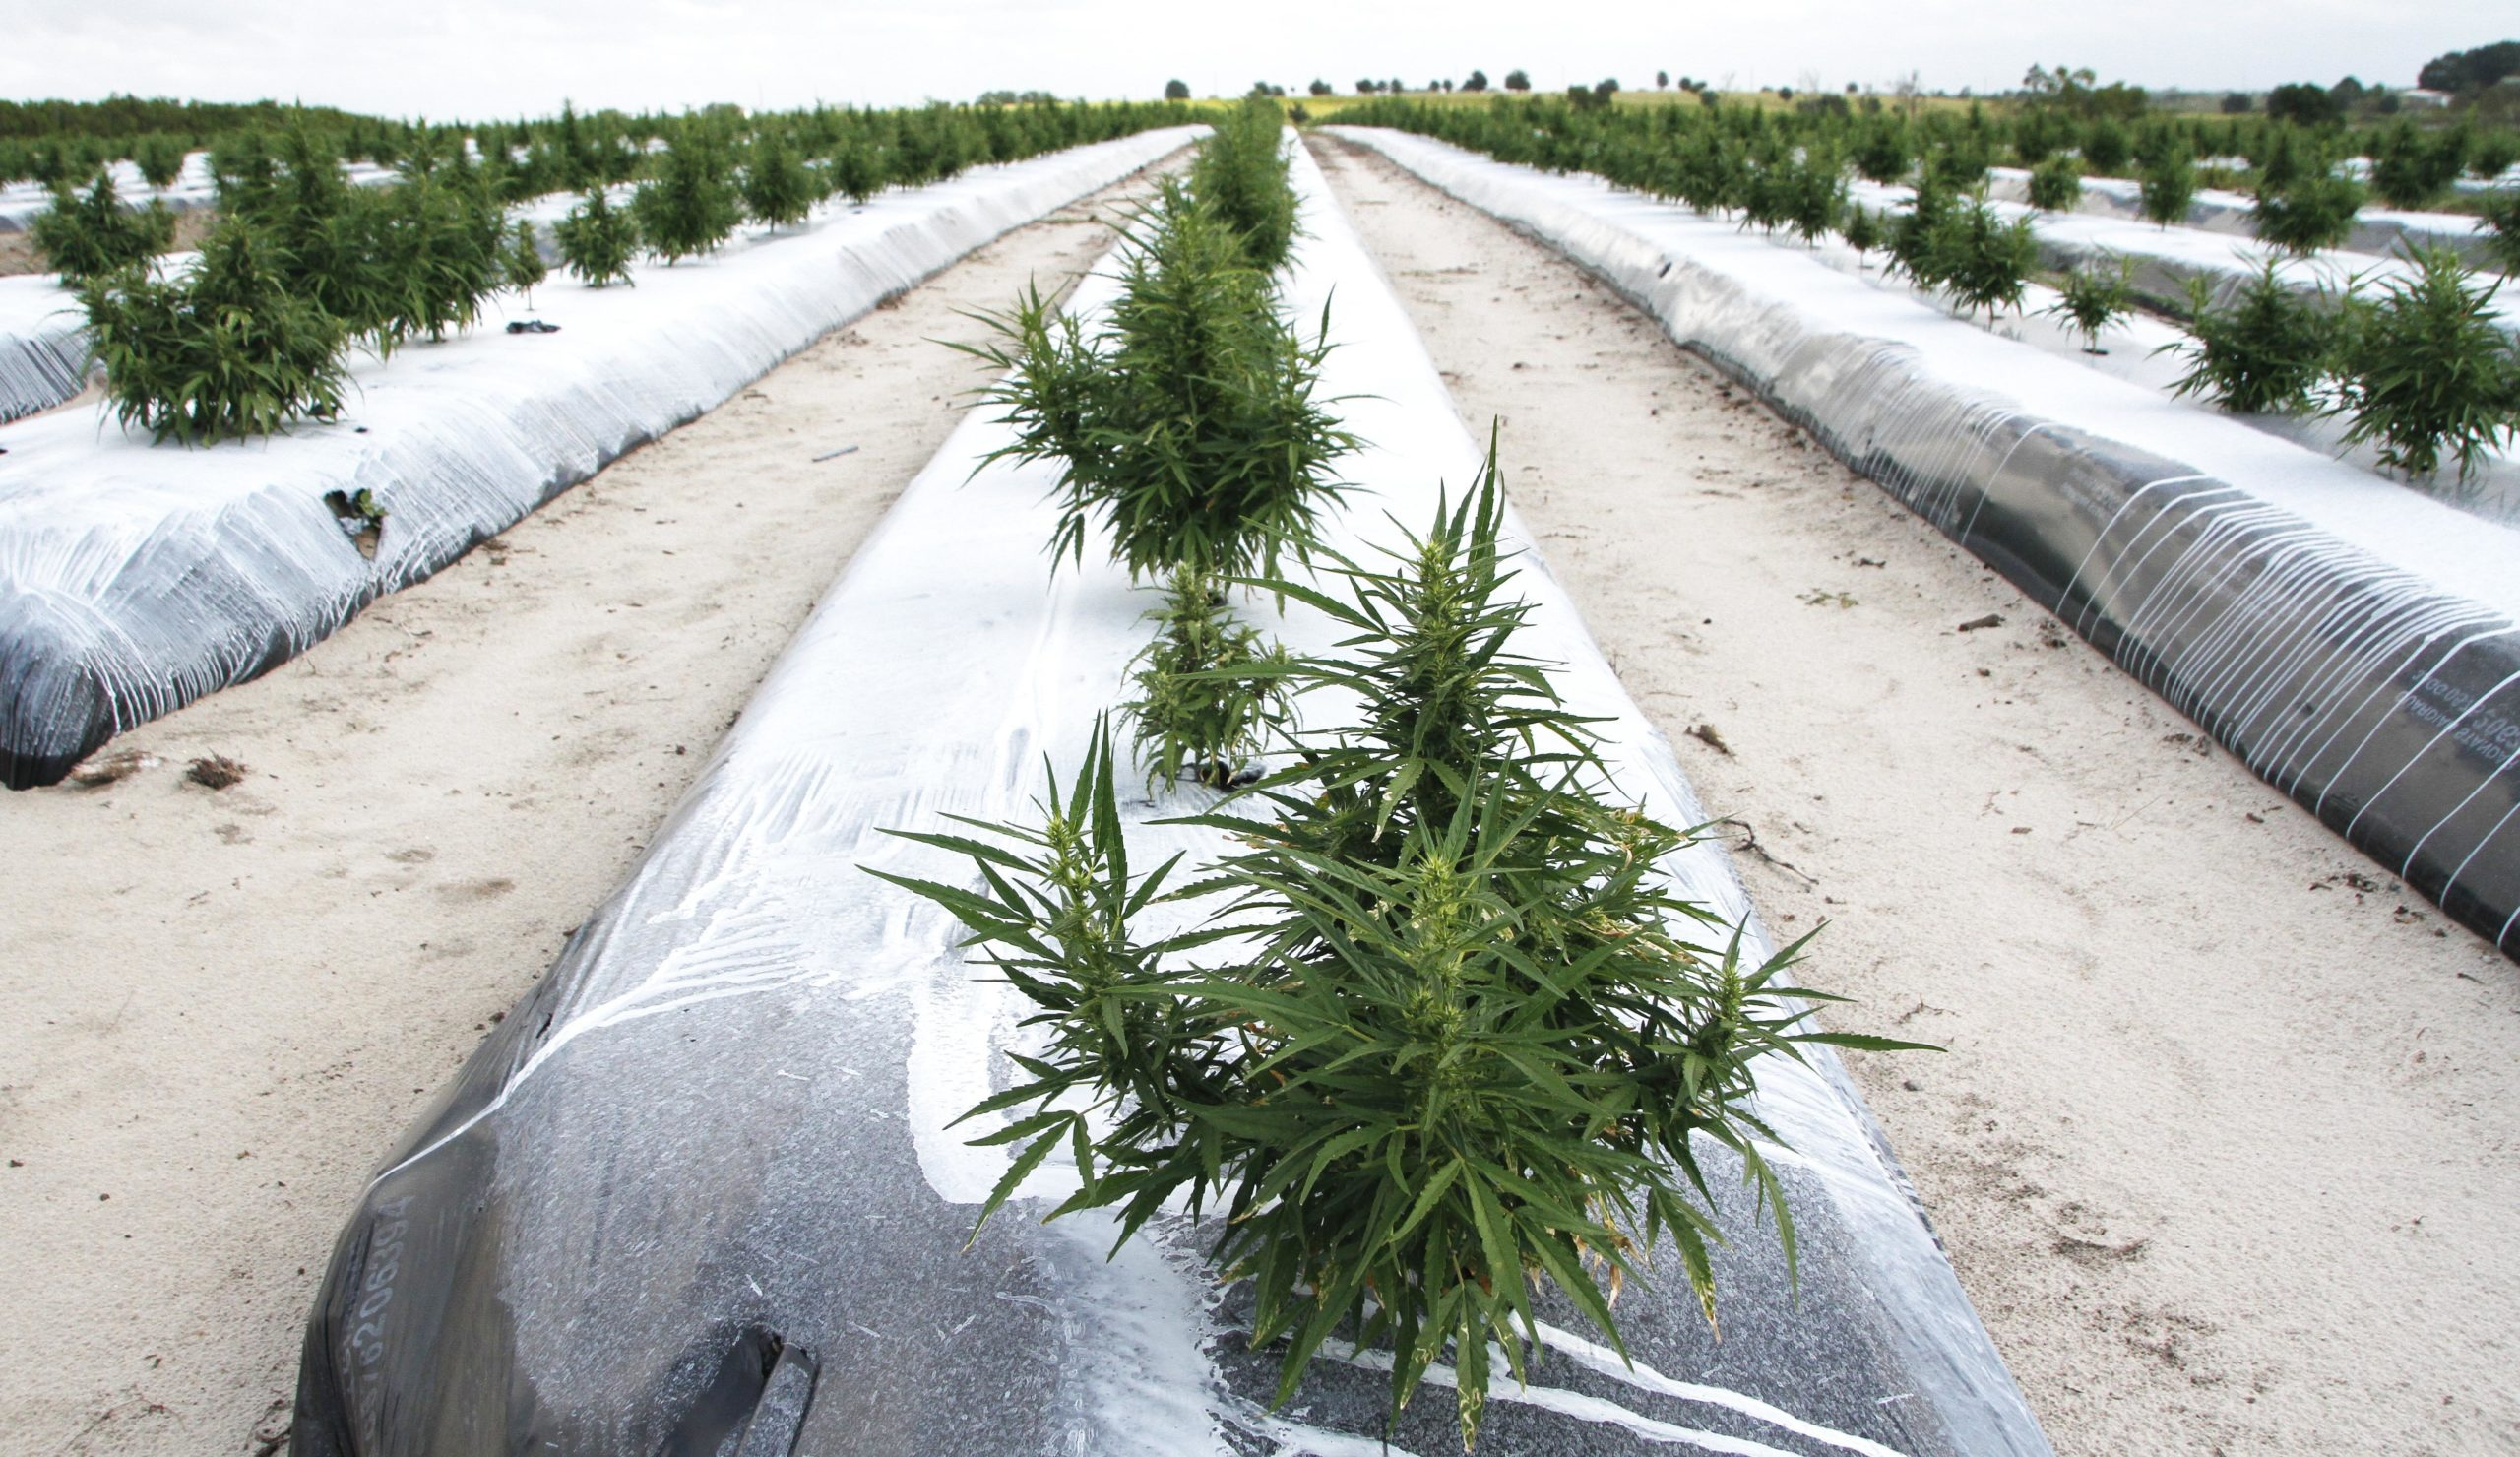 Commercial hemp around the corner in Florida - The Ledger